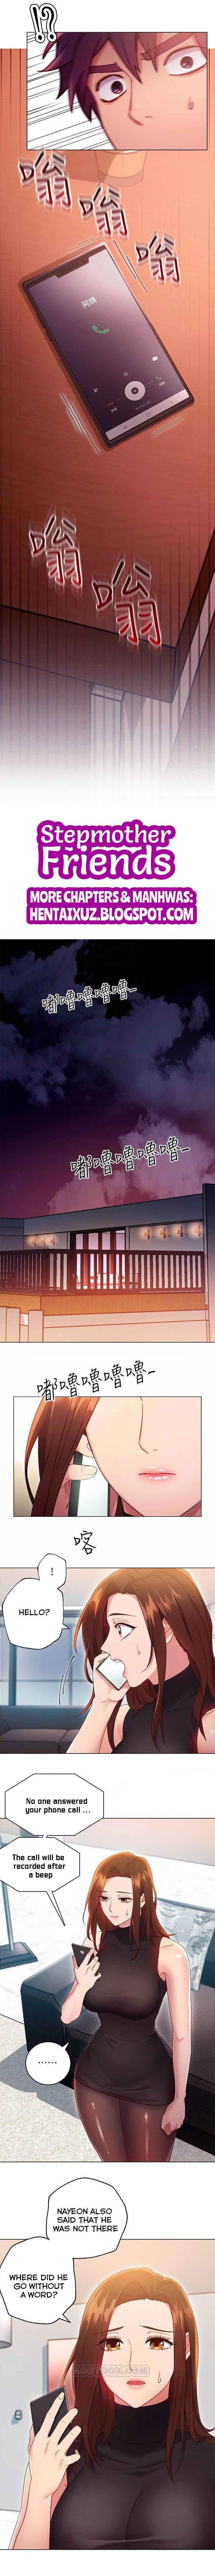 [Neck Pilllow] Stepmother Friends Ch.39/? [English] [Hentai Universe] NEW! 13/10/2020 123